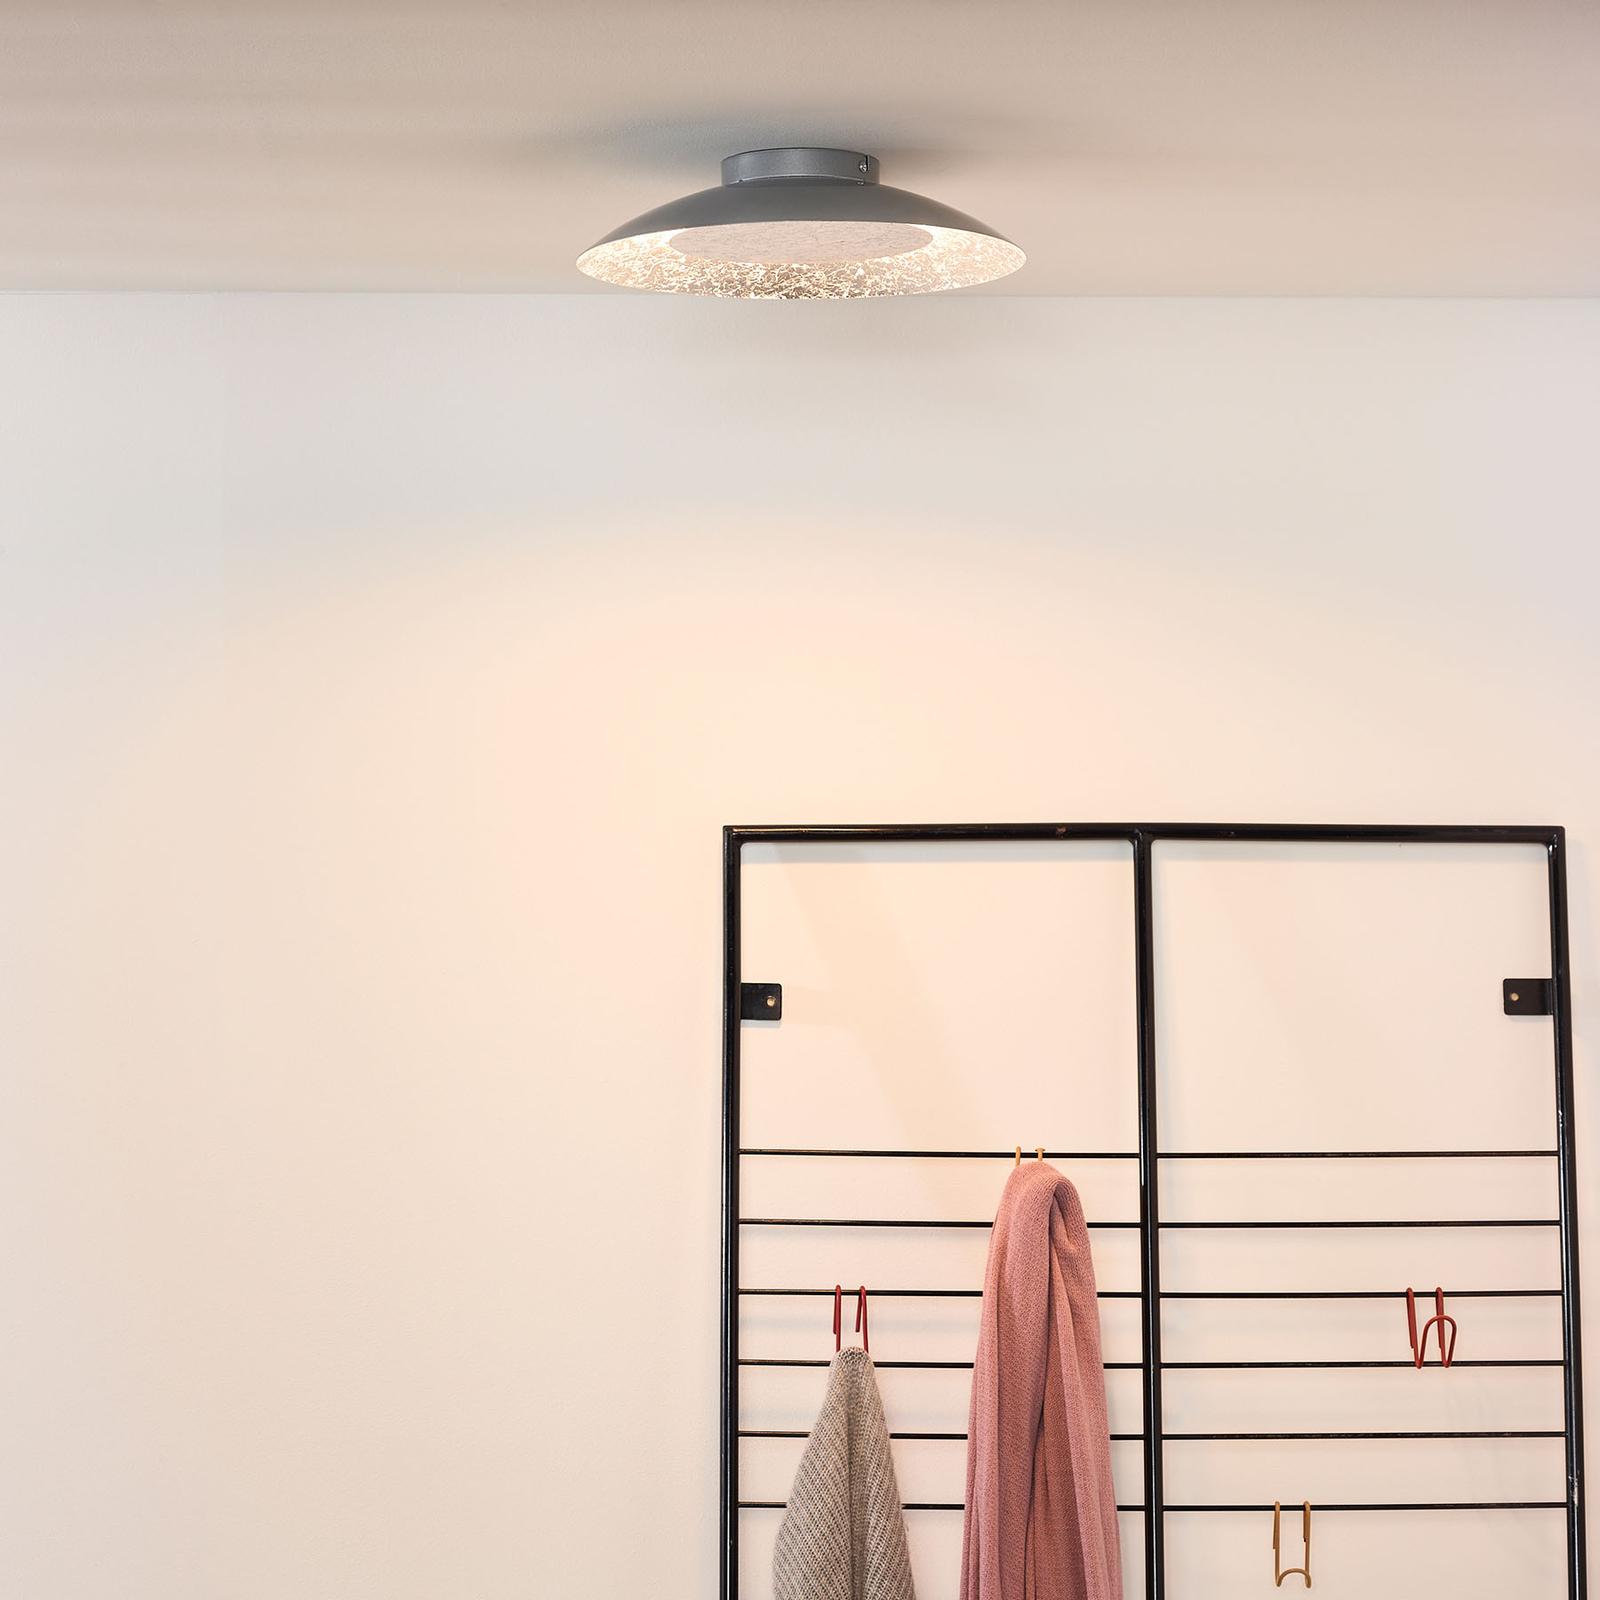 LED-kattovalaisin Foskal, hopea, Ø 34,5 cm